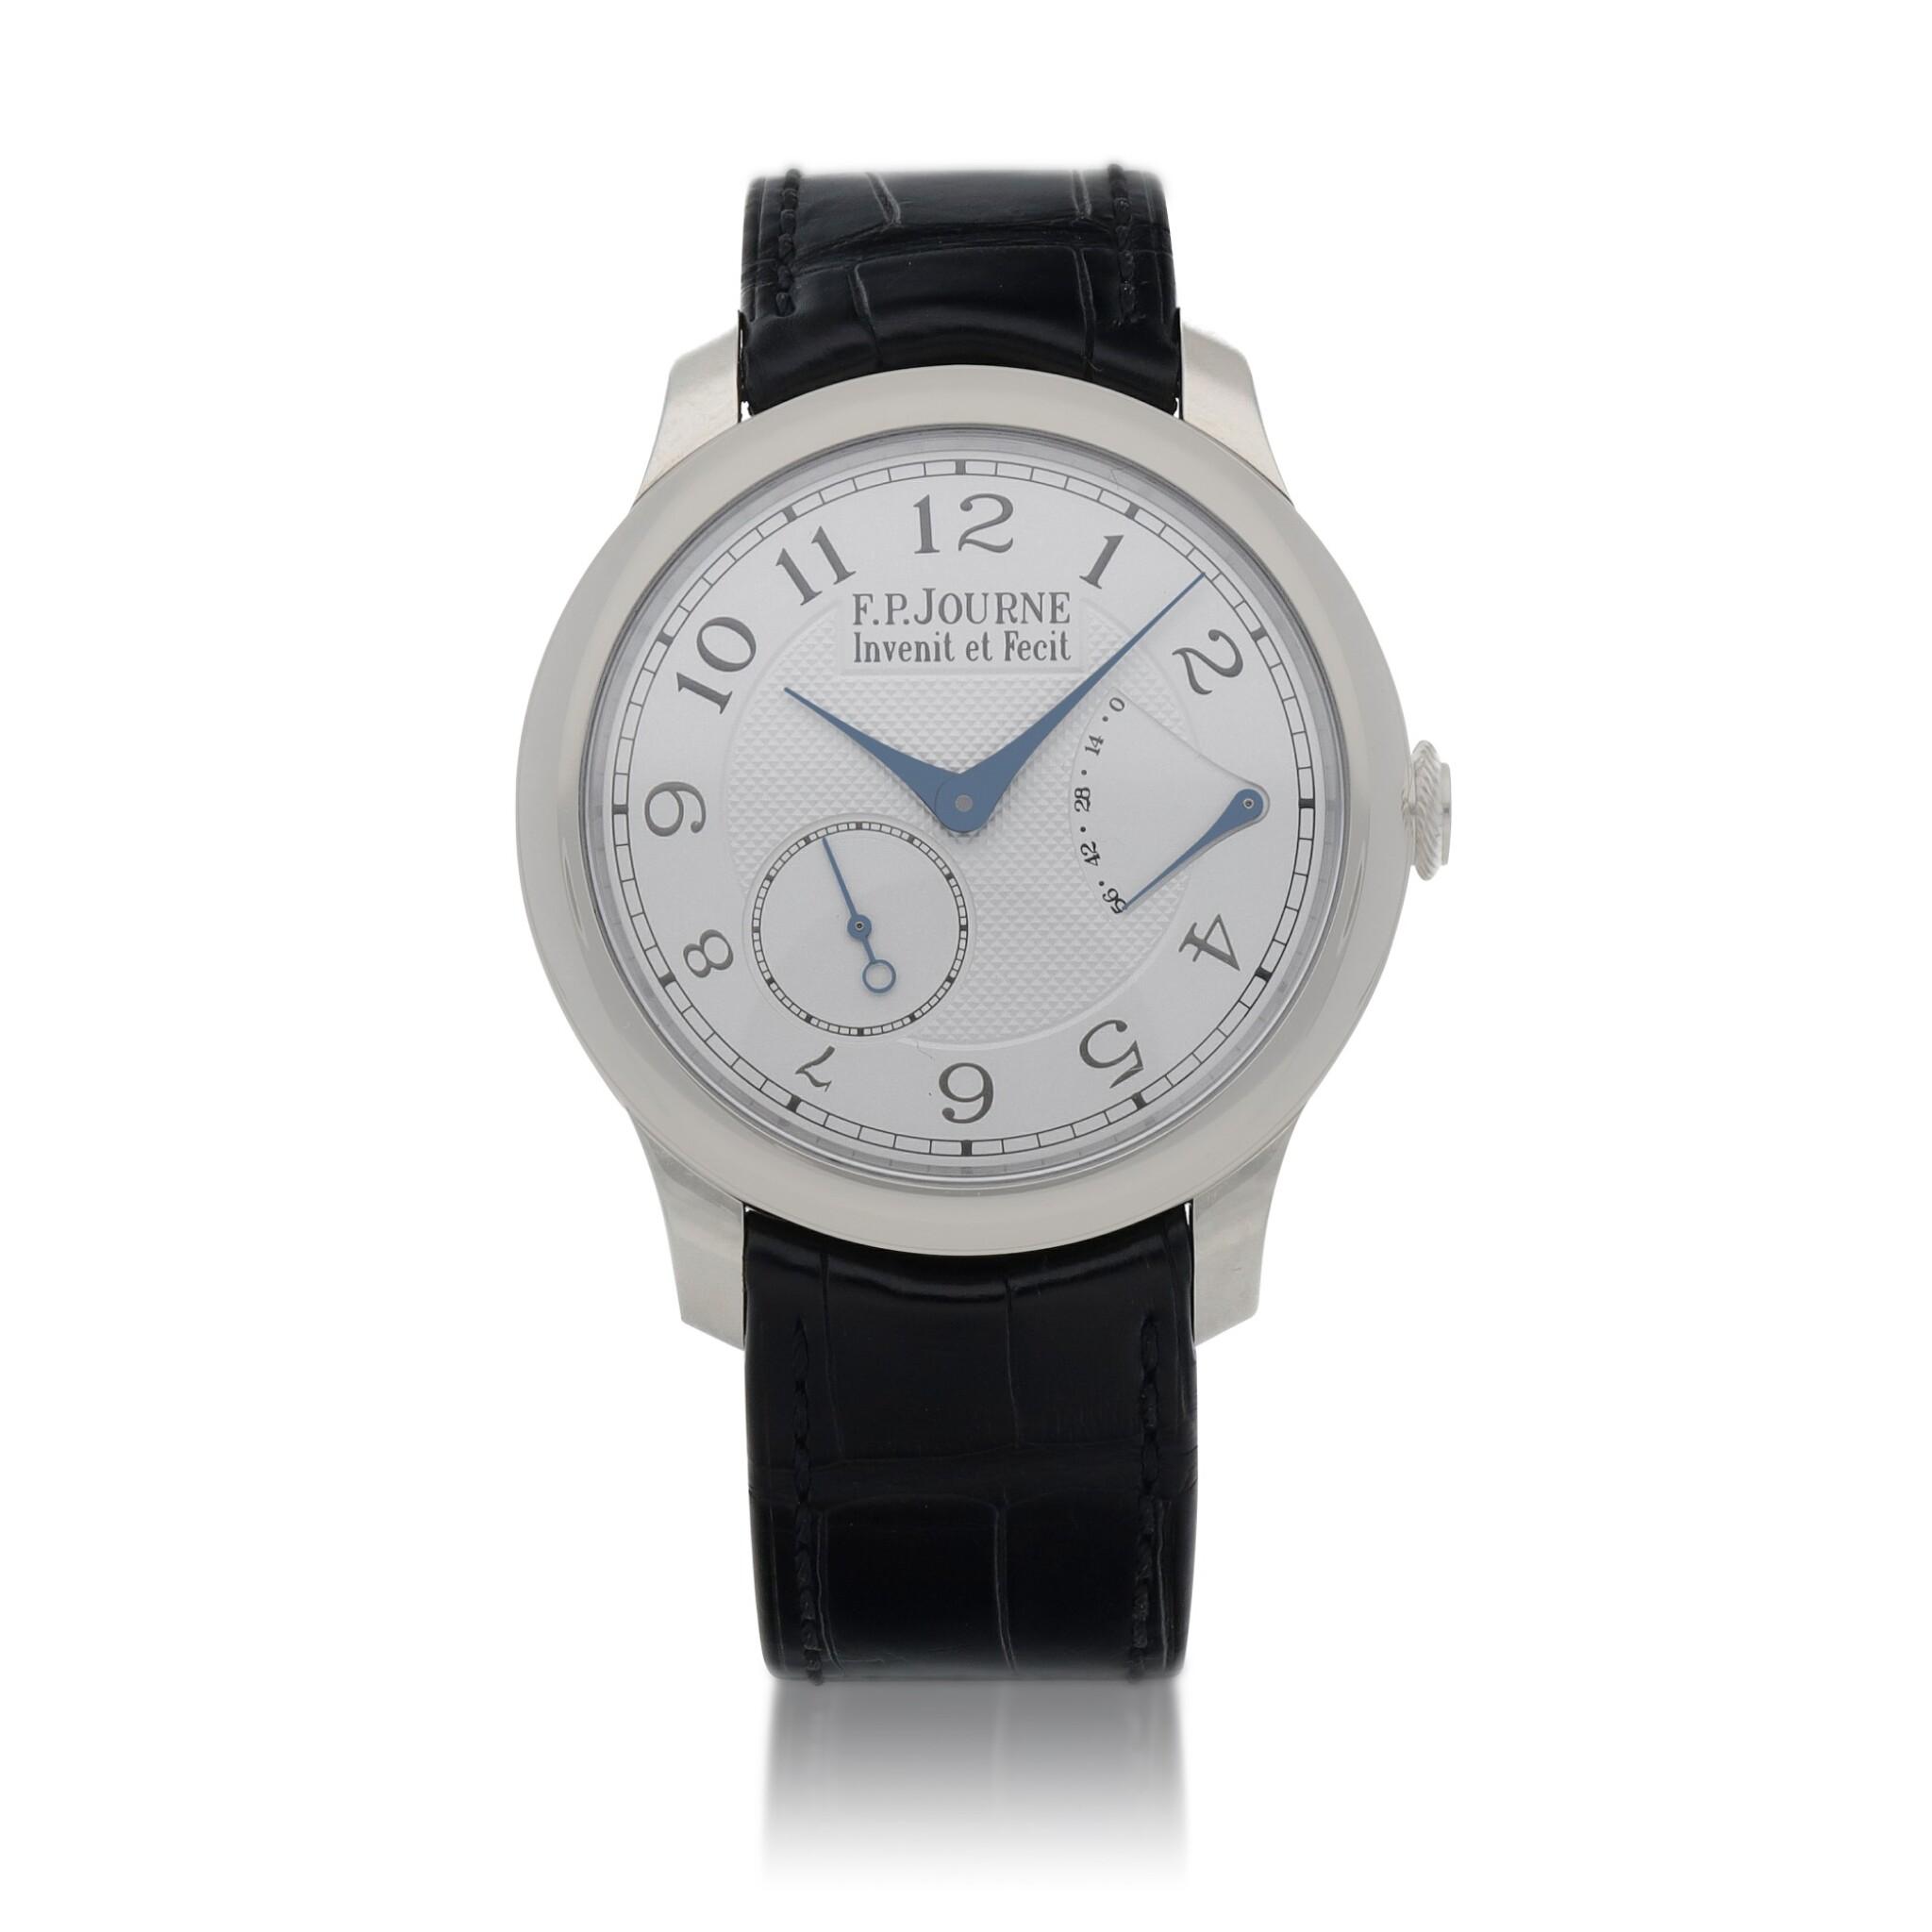 View full screen - View 1 of Lot 43. Chronomètre Souverain Platinum wristwatch with power reserve indication Circa 2020   F.P. Journe「Chronomètre Souverain」鉑金腕錶備動力儲存顯示,年份約2020.